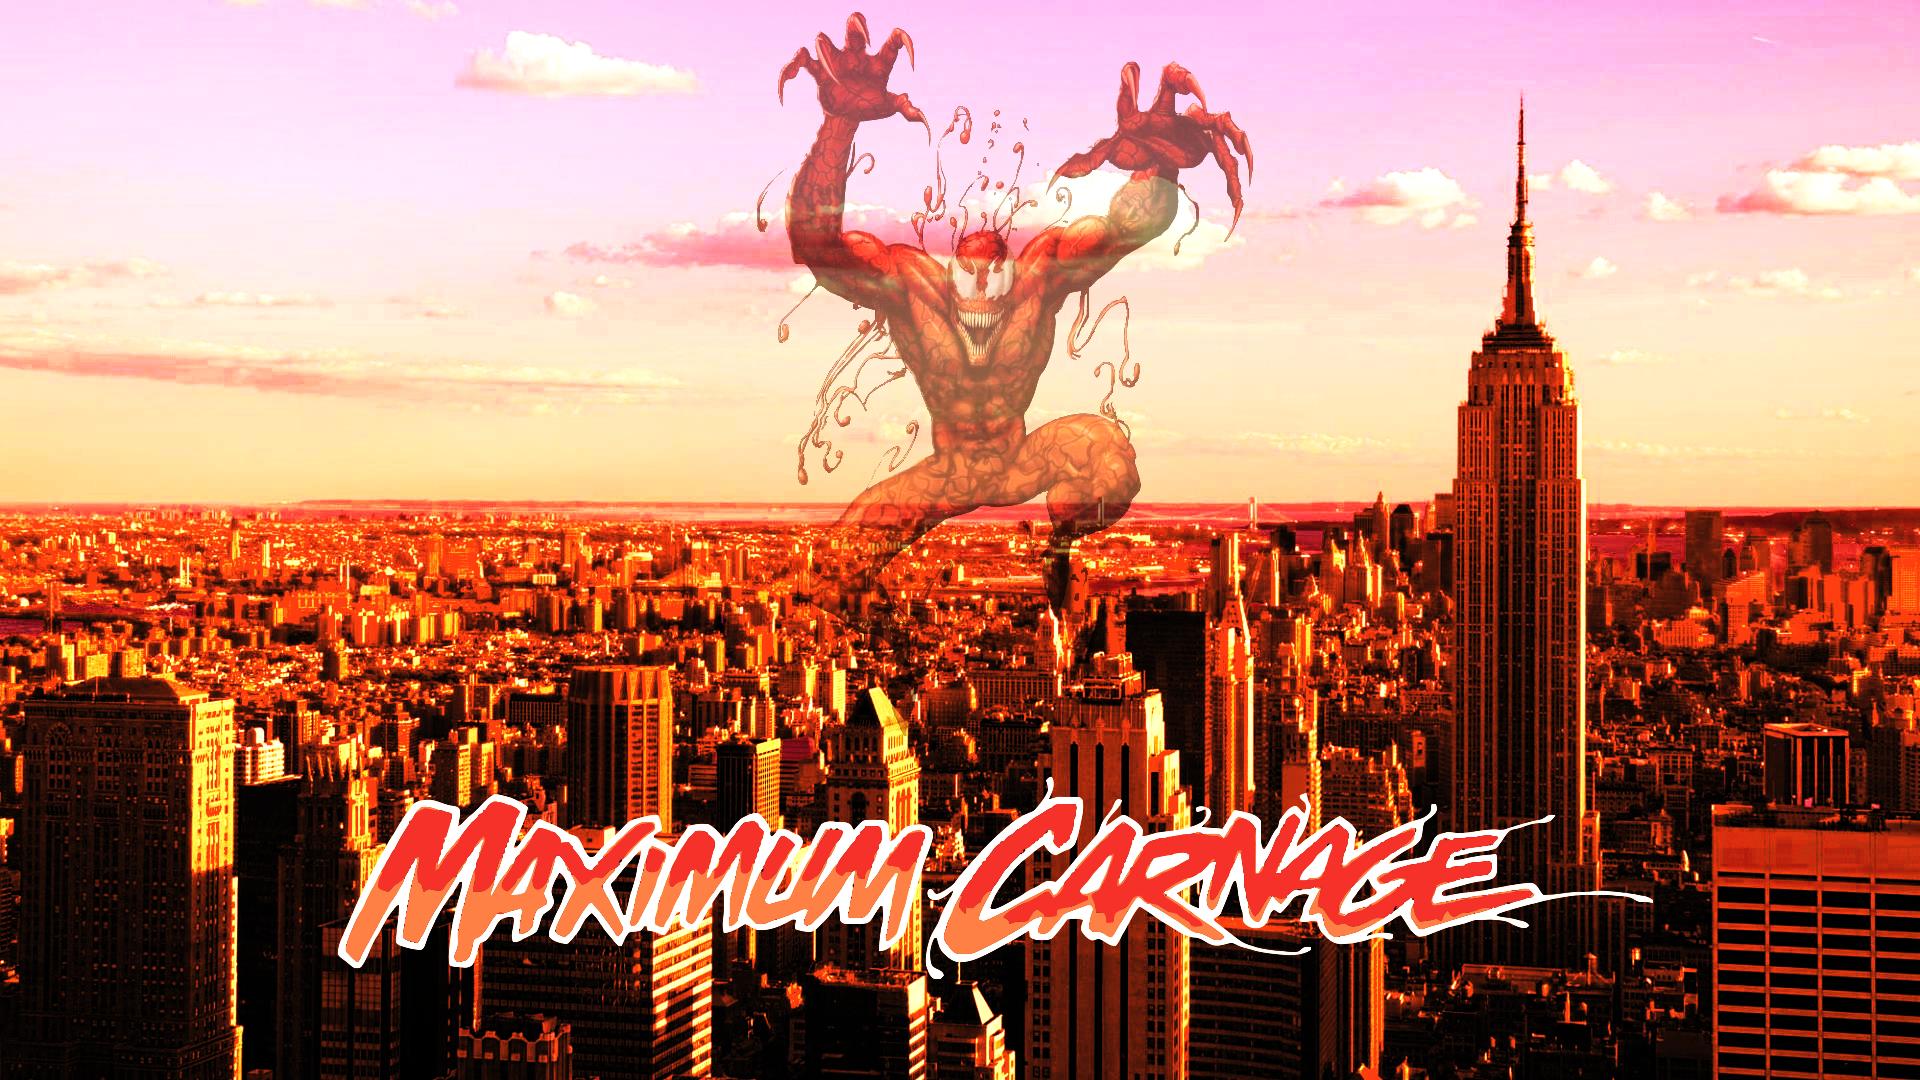 maximum carnage wallpaper - photo #15